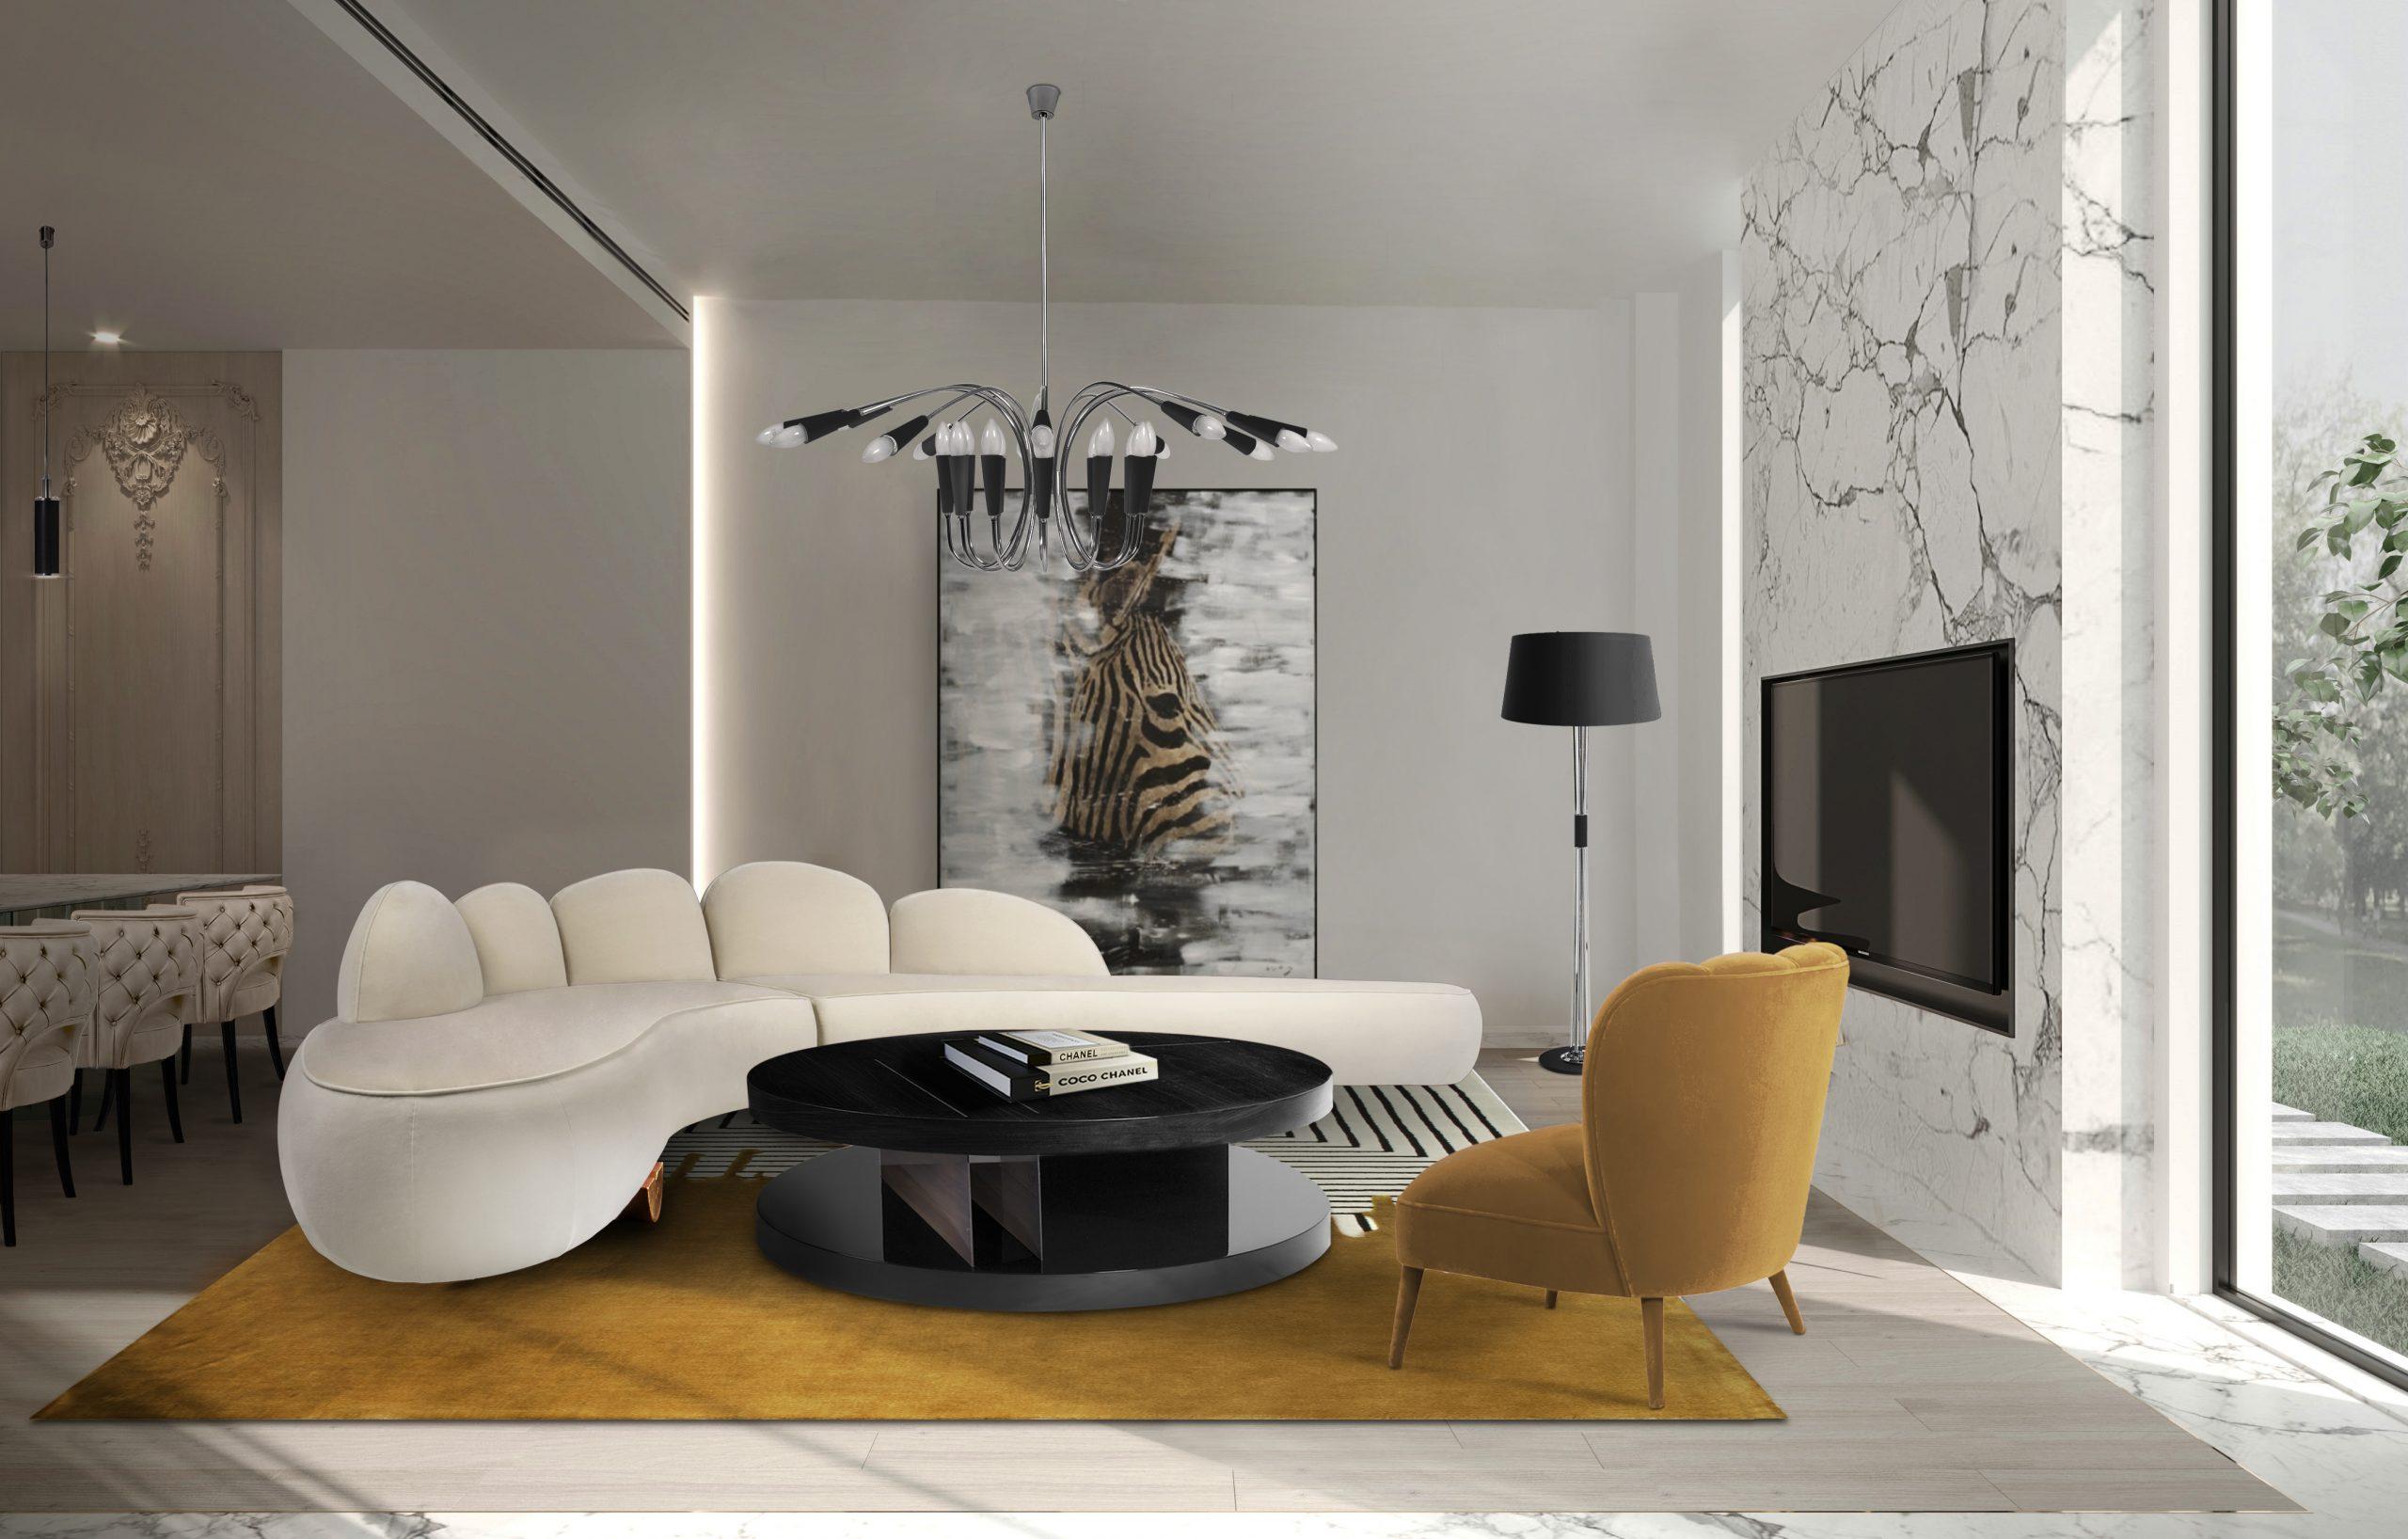 Fitzroy Living Room - Amazing Living Room Decor Ideas home inspiration ideas